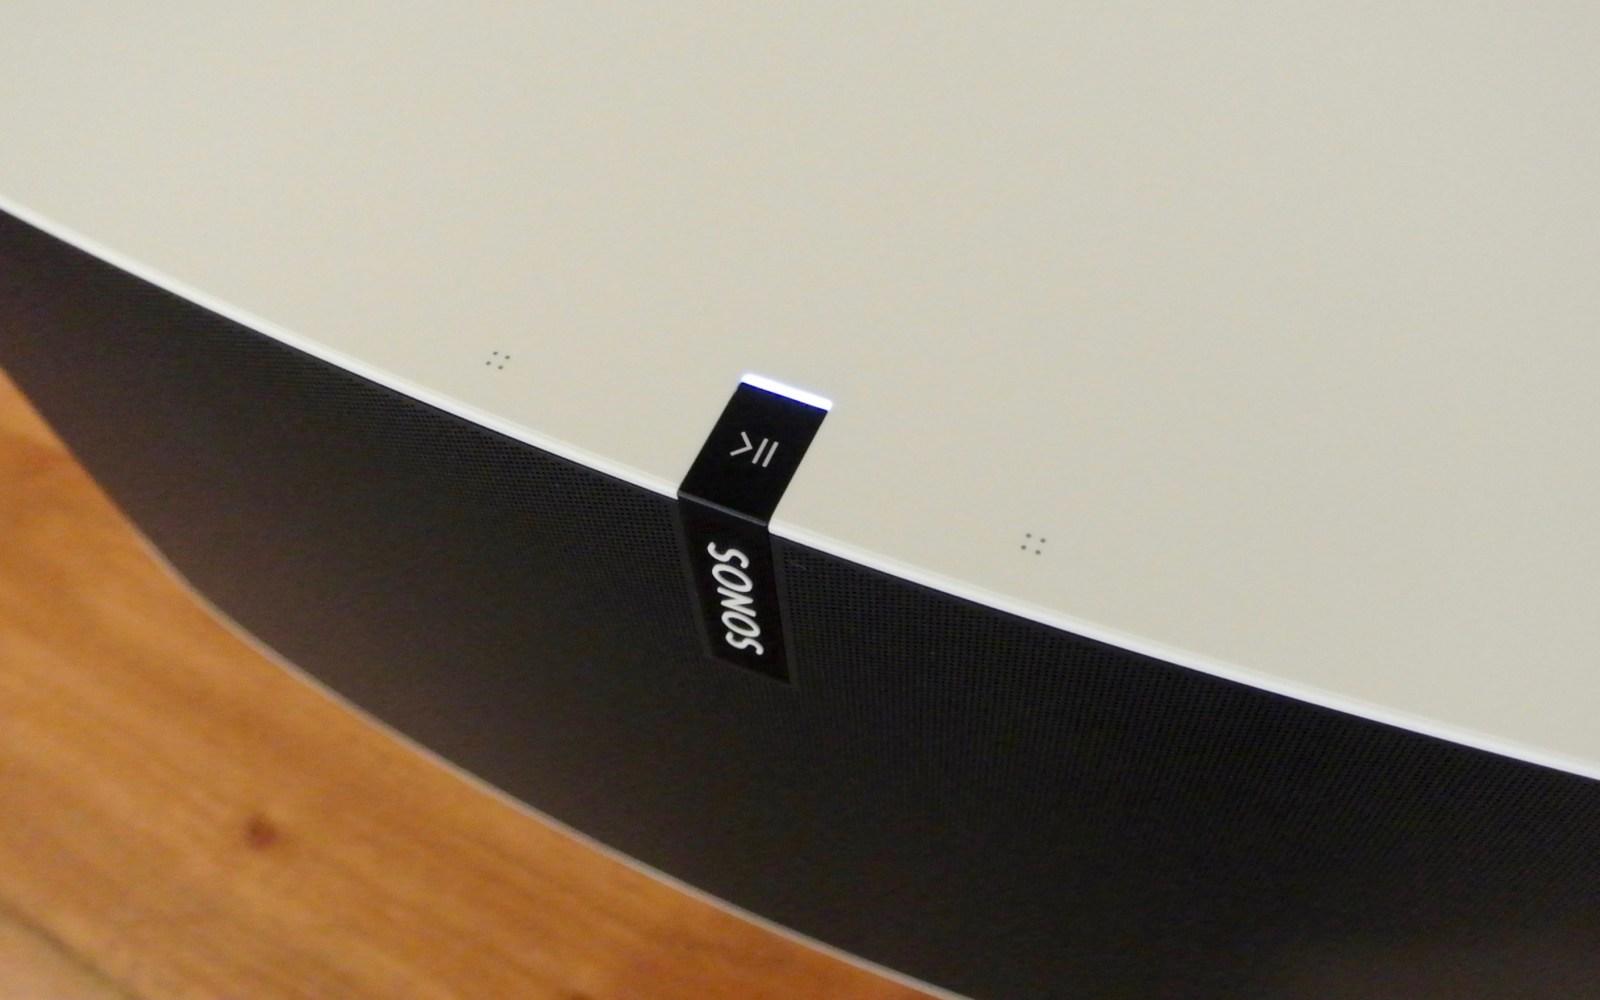 Sonos upgrades flagship Play:5 HiFi wireless speaker with new design, overhauled sound; unveils Trueplay tuning software